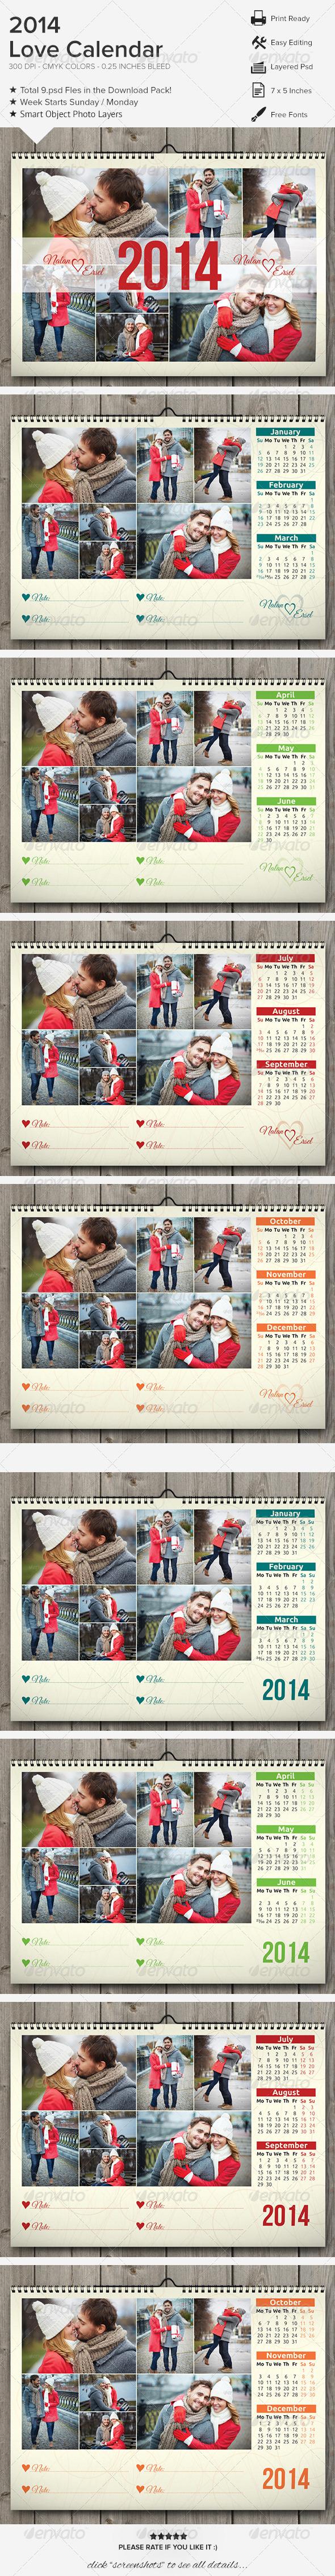 GraphicRiver Love Calendar 2014 6318037